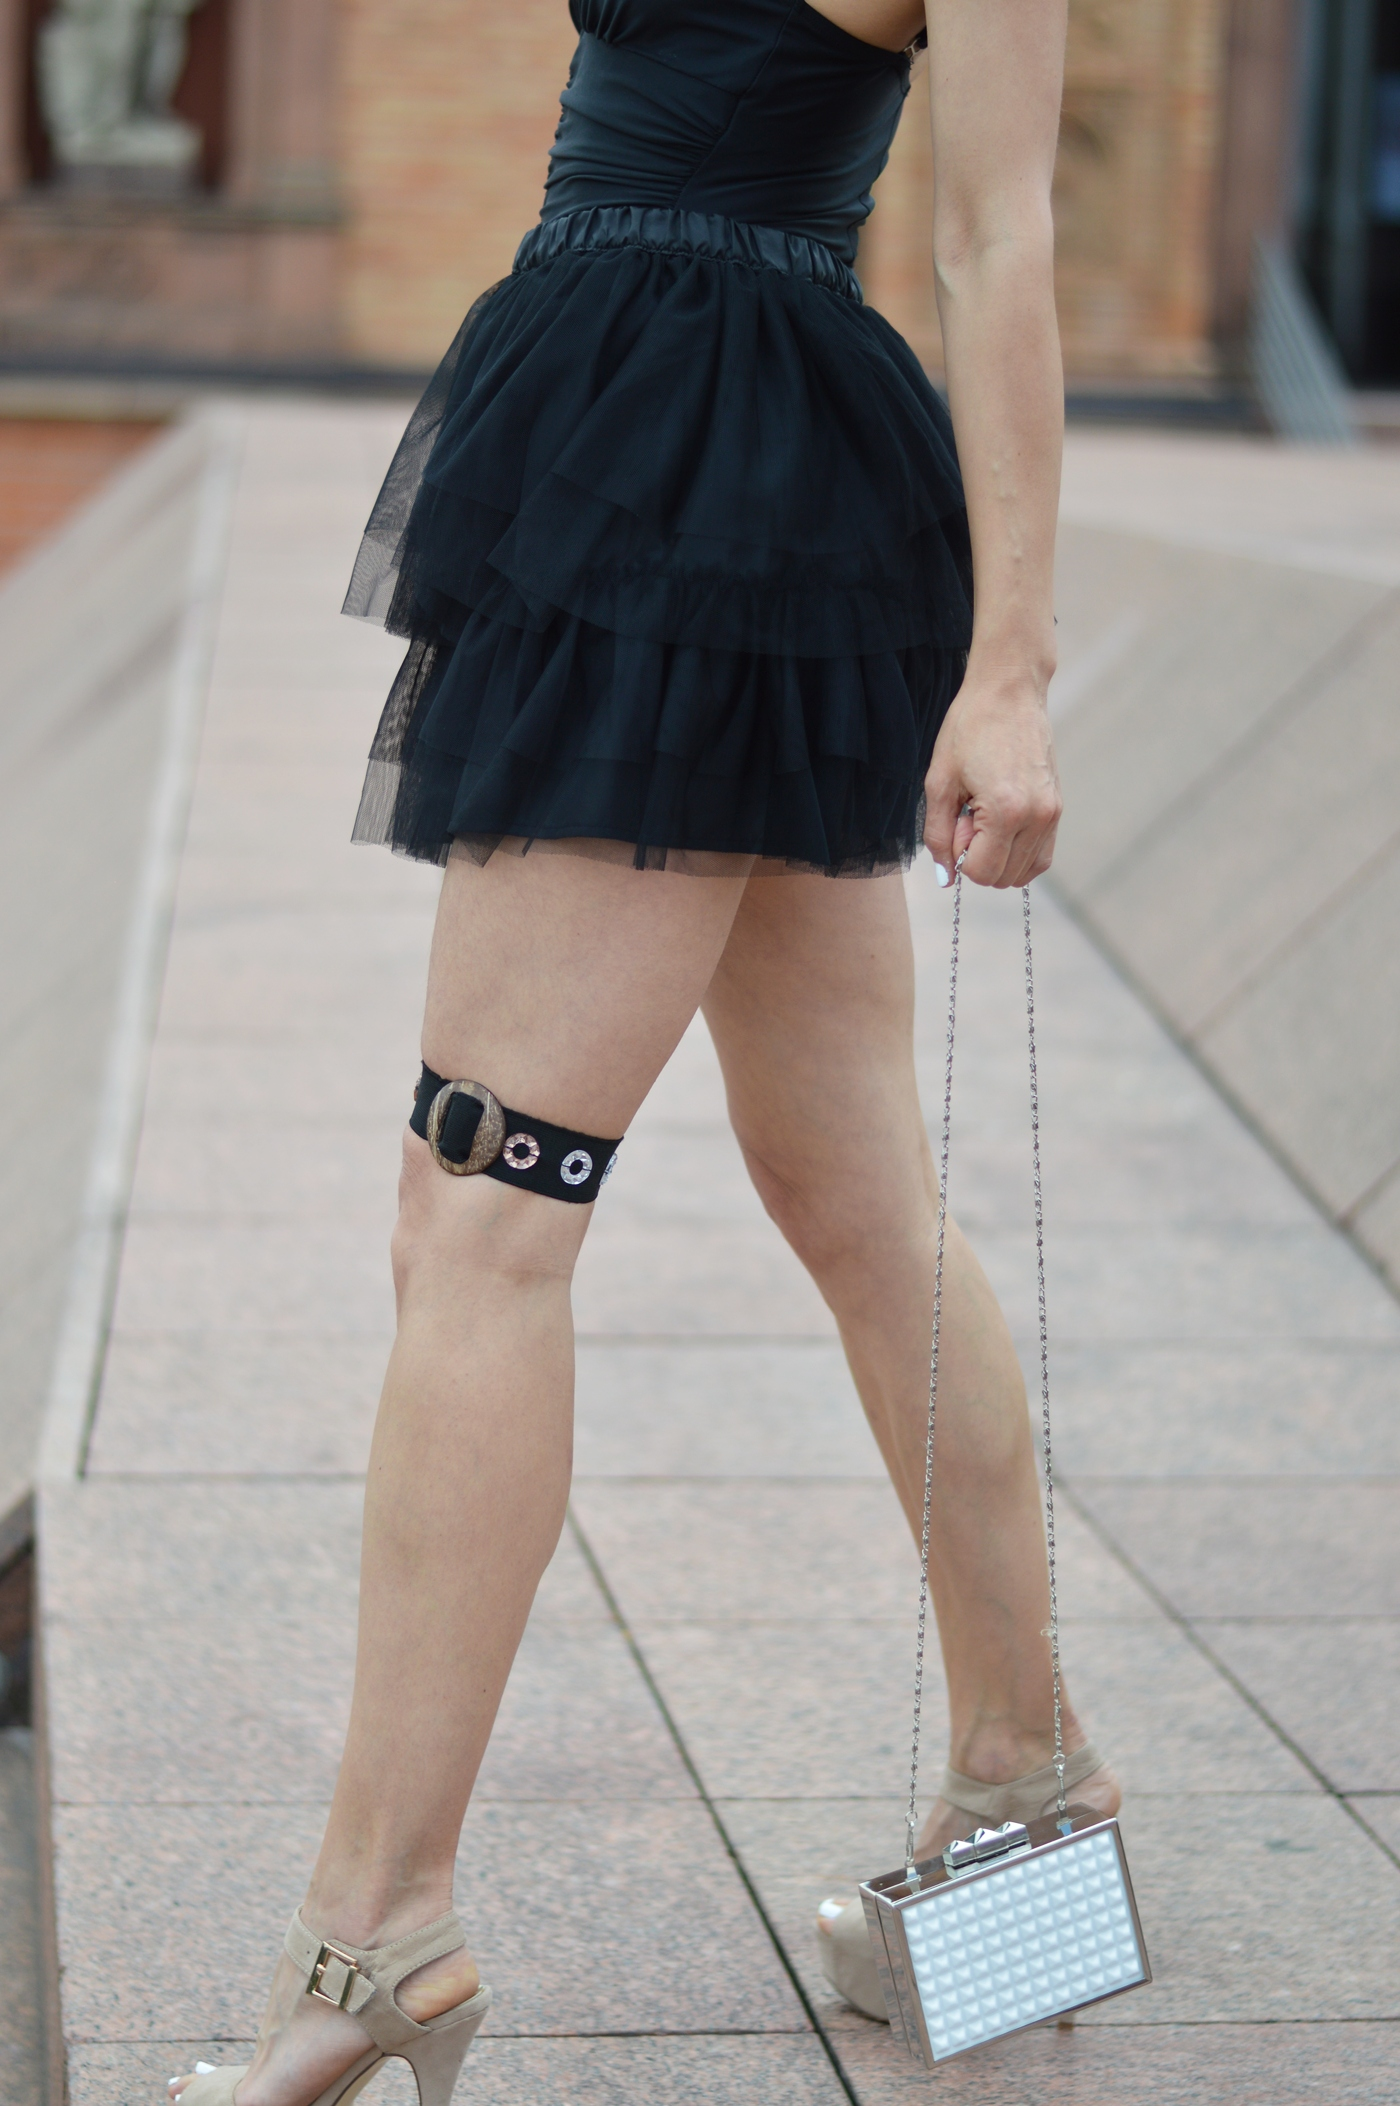 Leg Harness